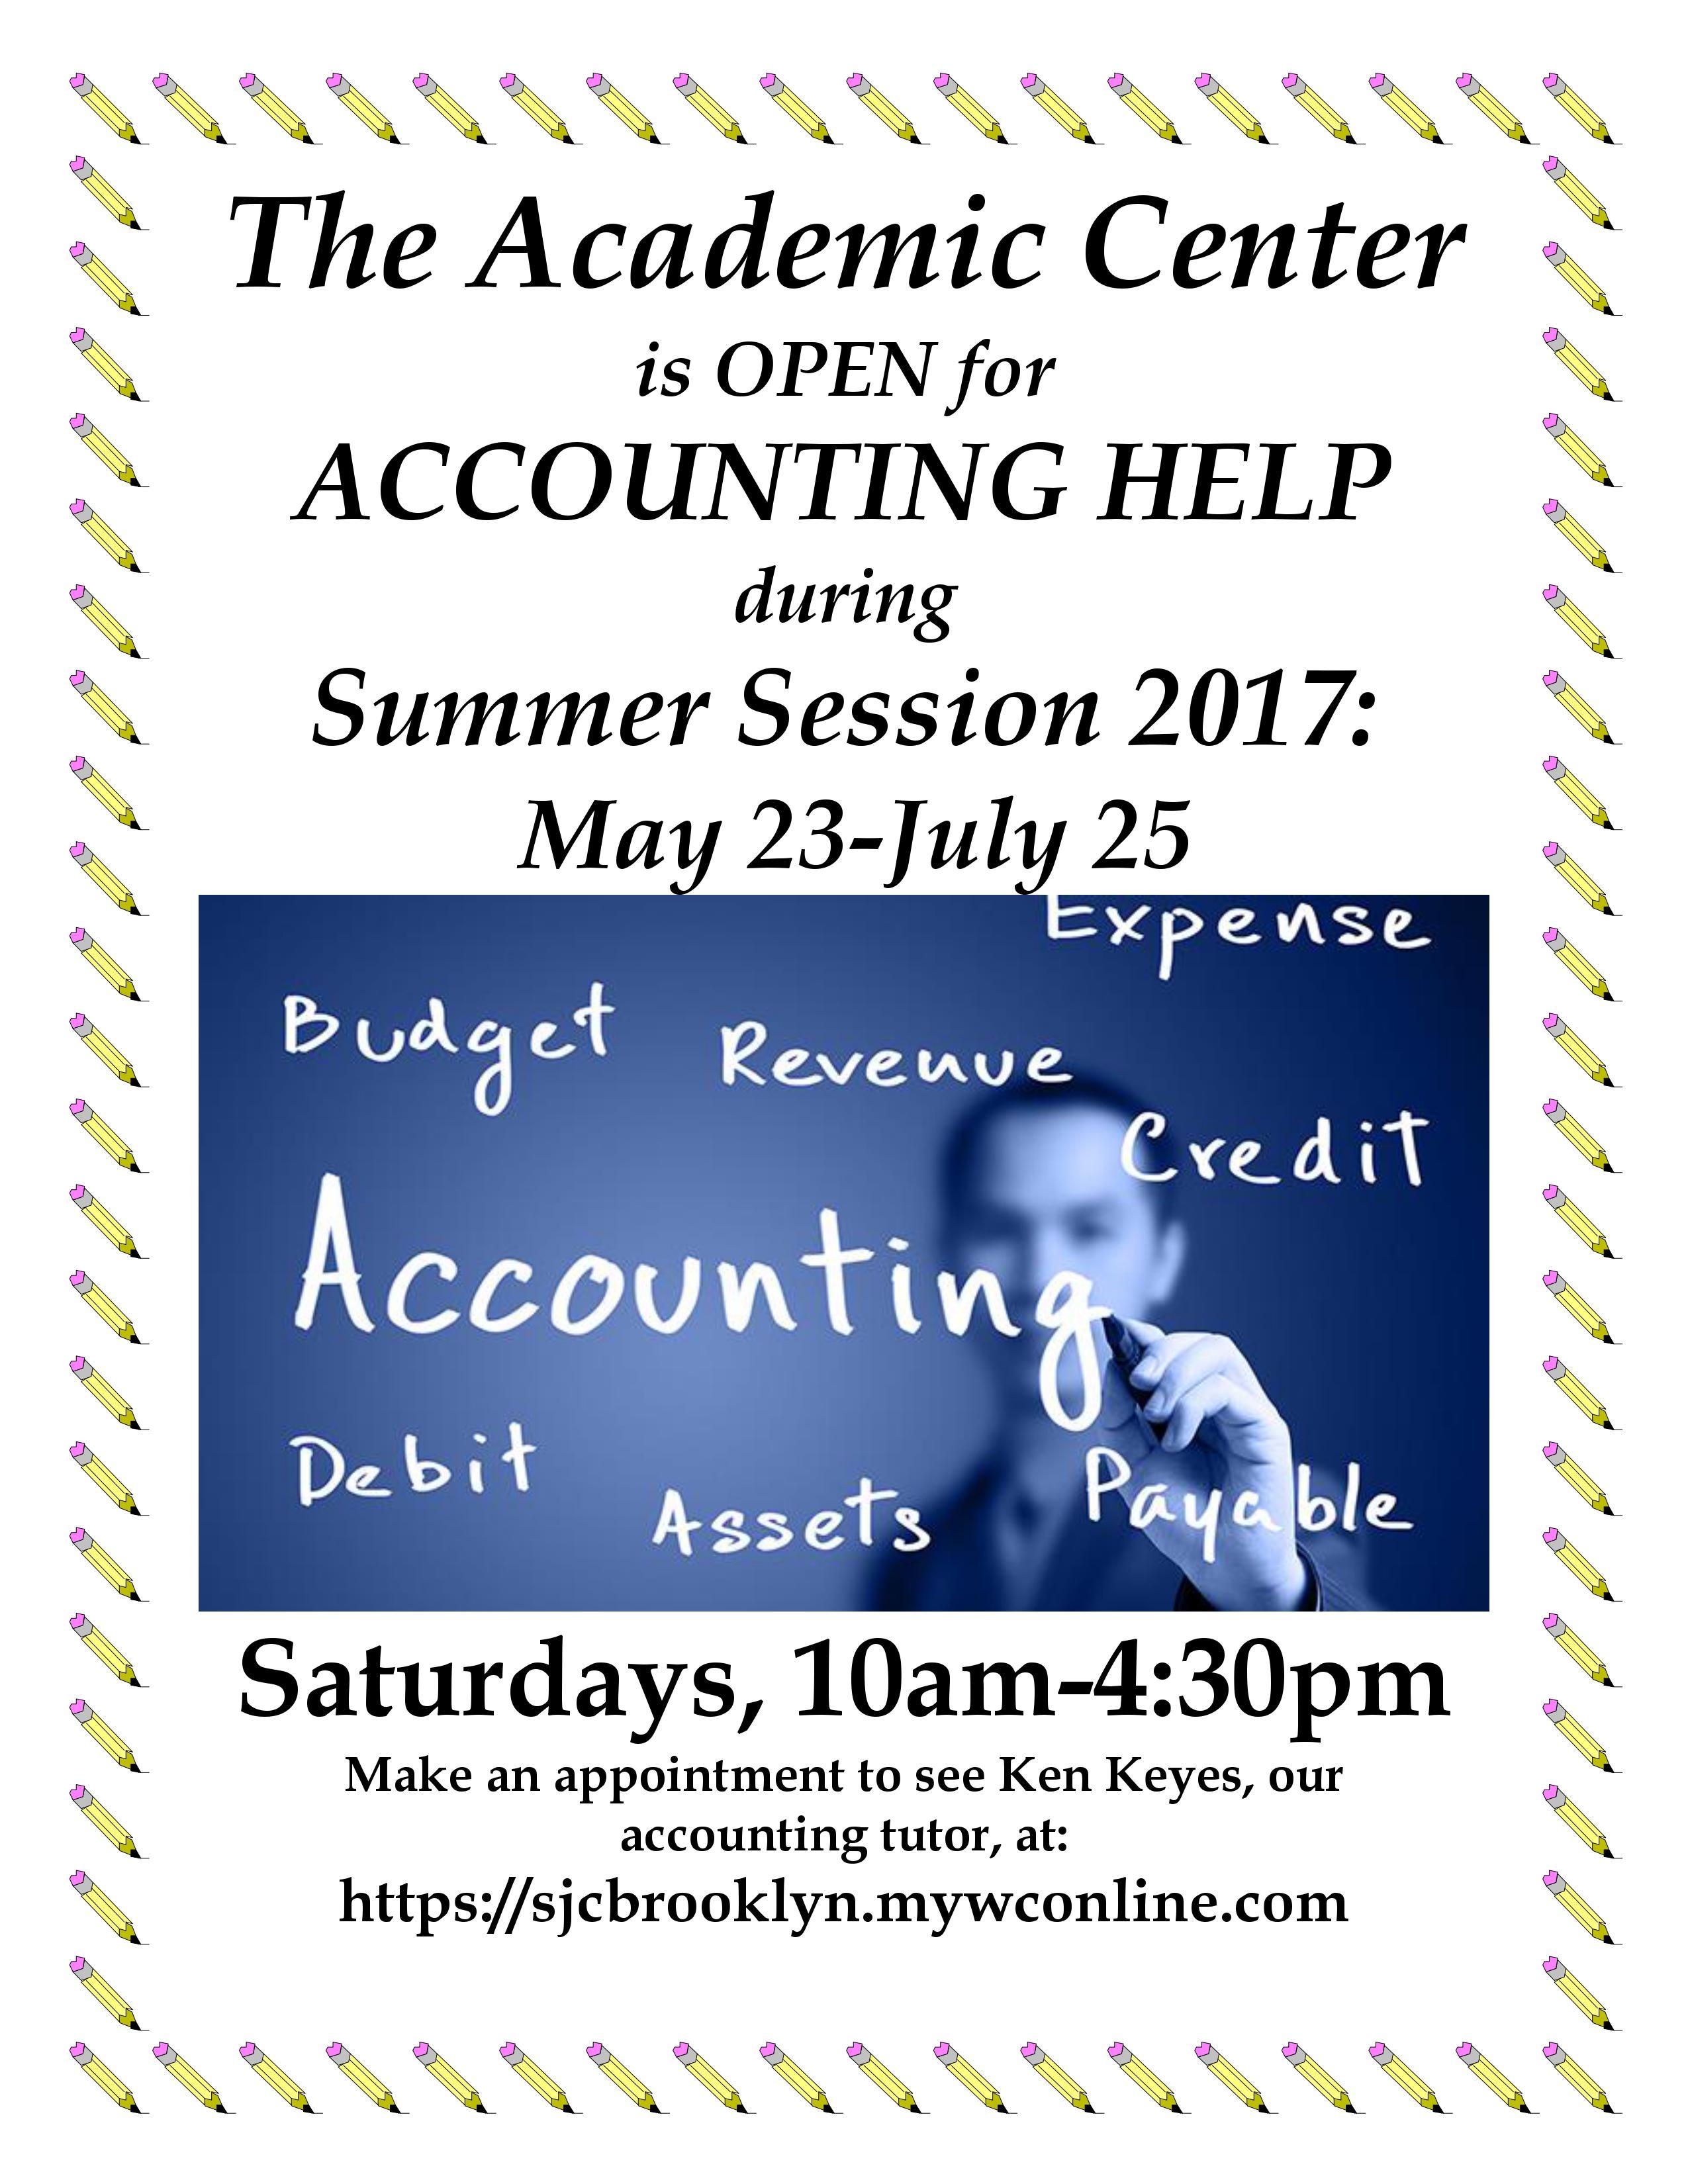 ACCOUNTING HELP Summer 2017